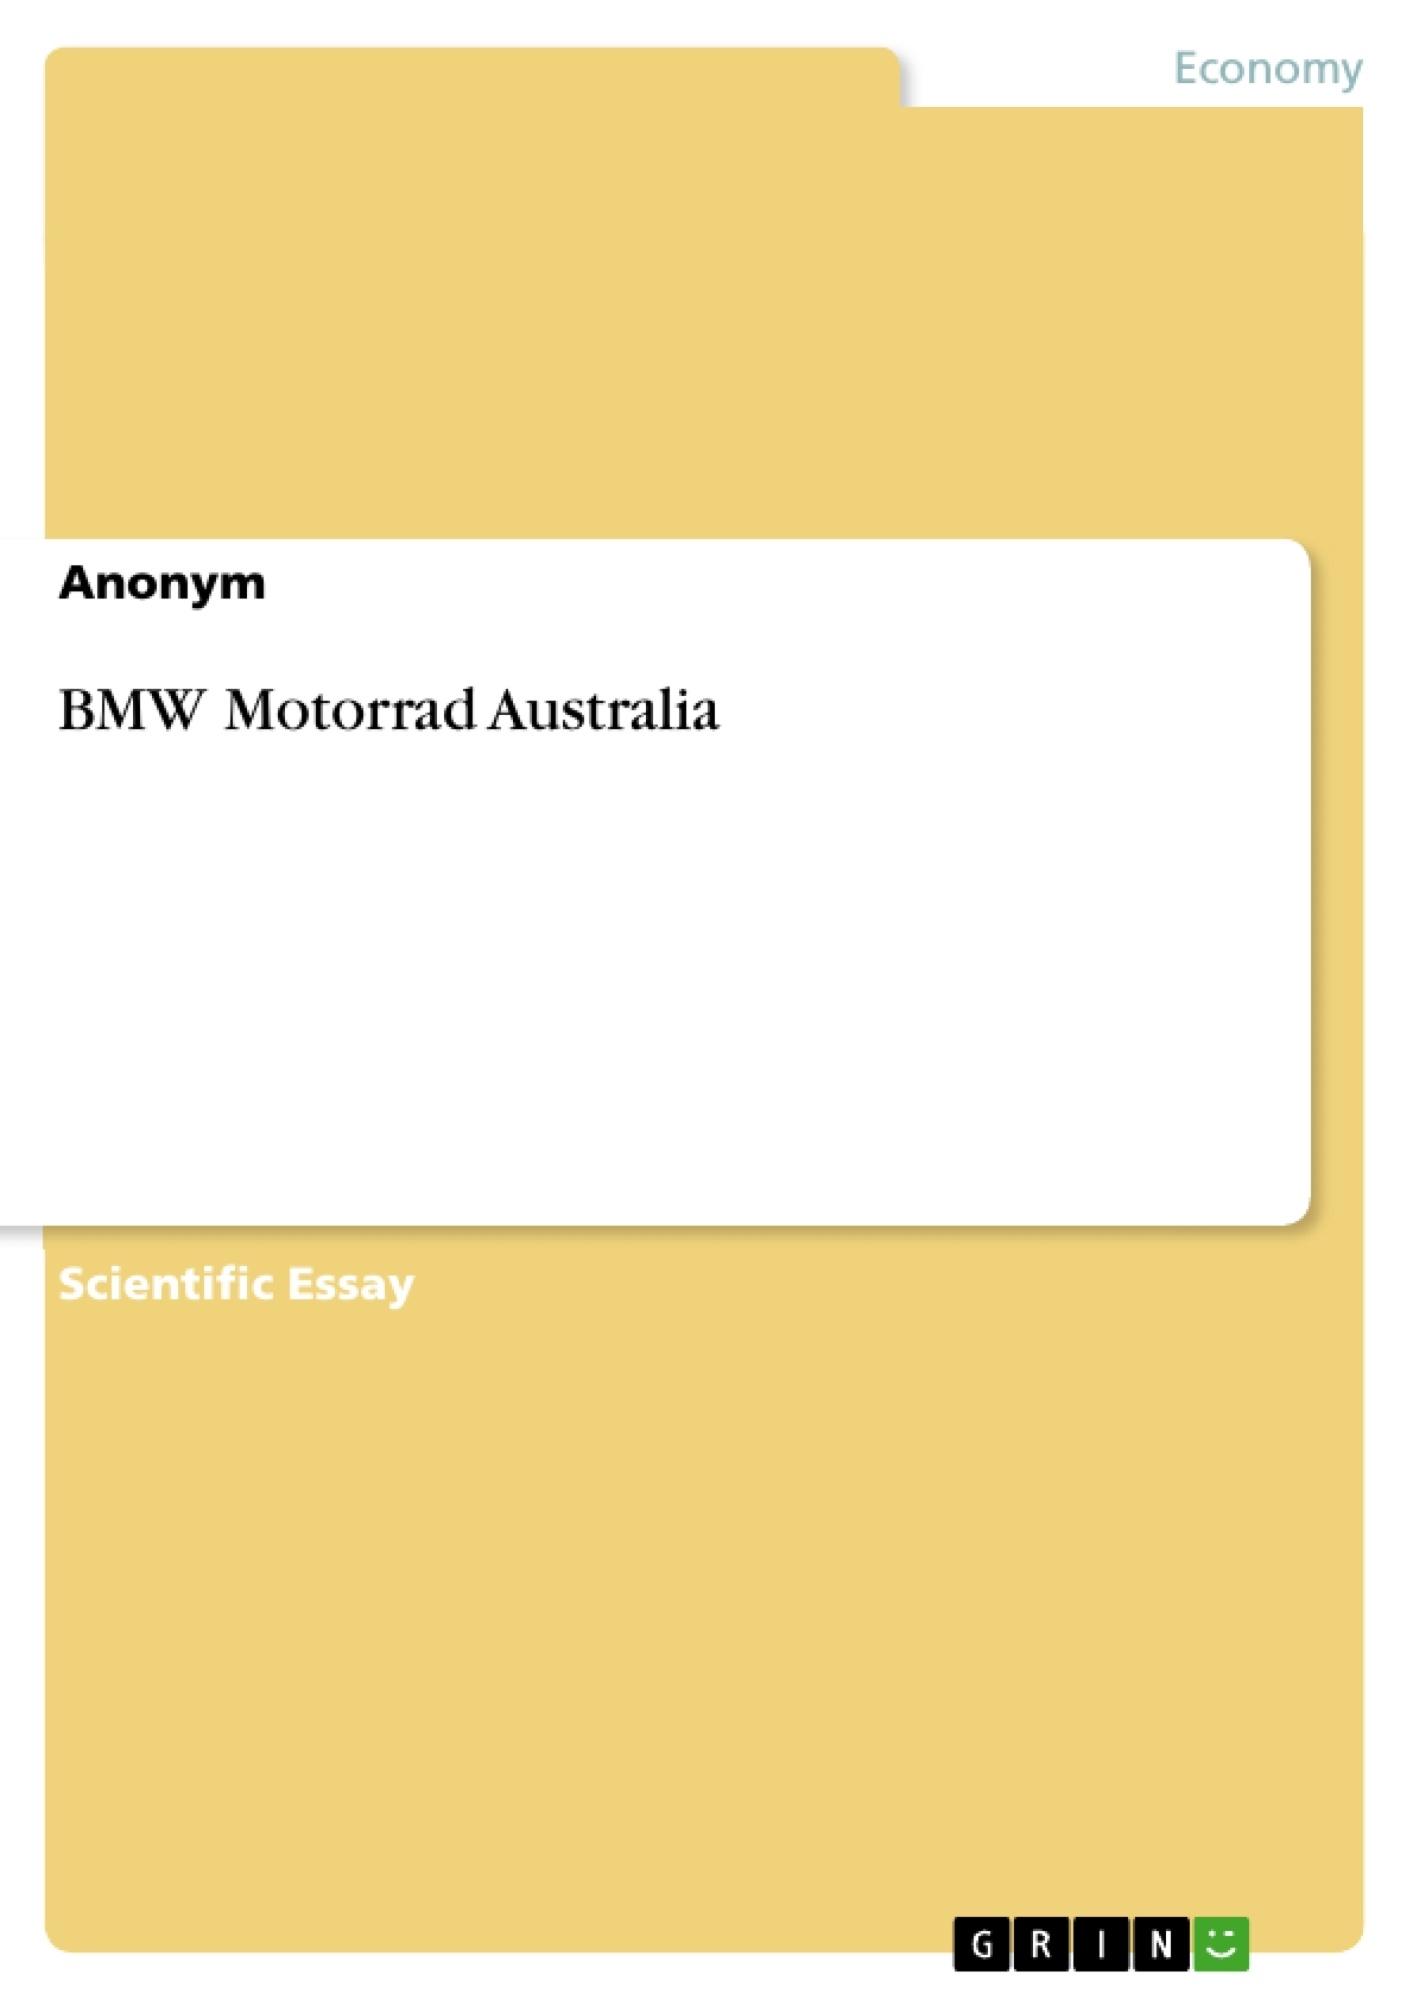 Title: BMW Motorrad Australia